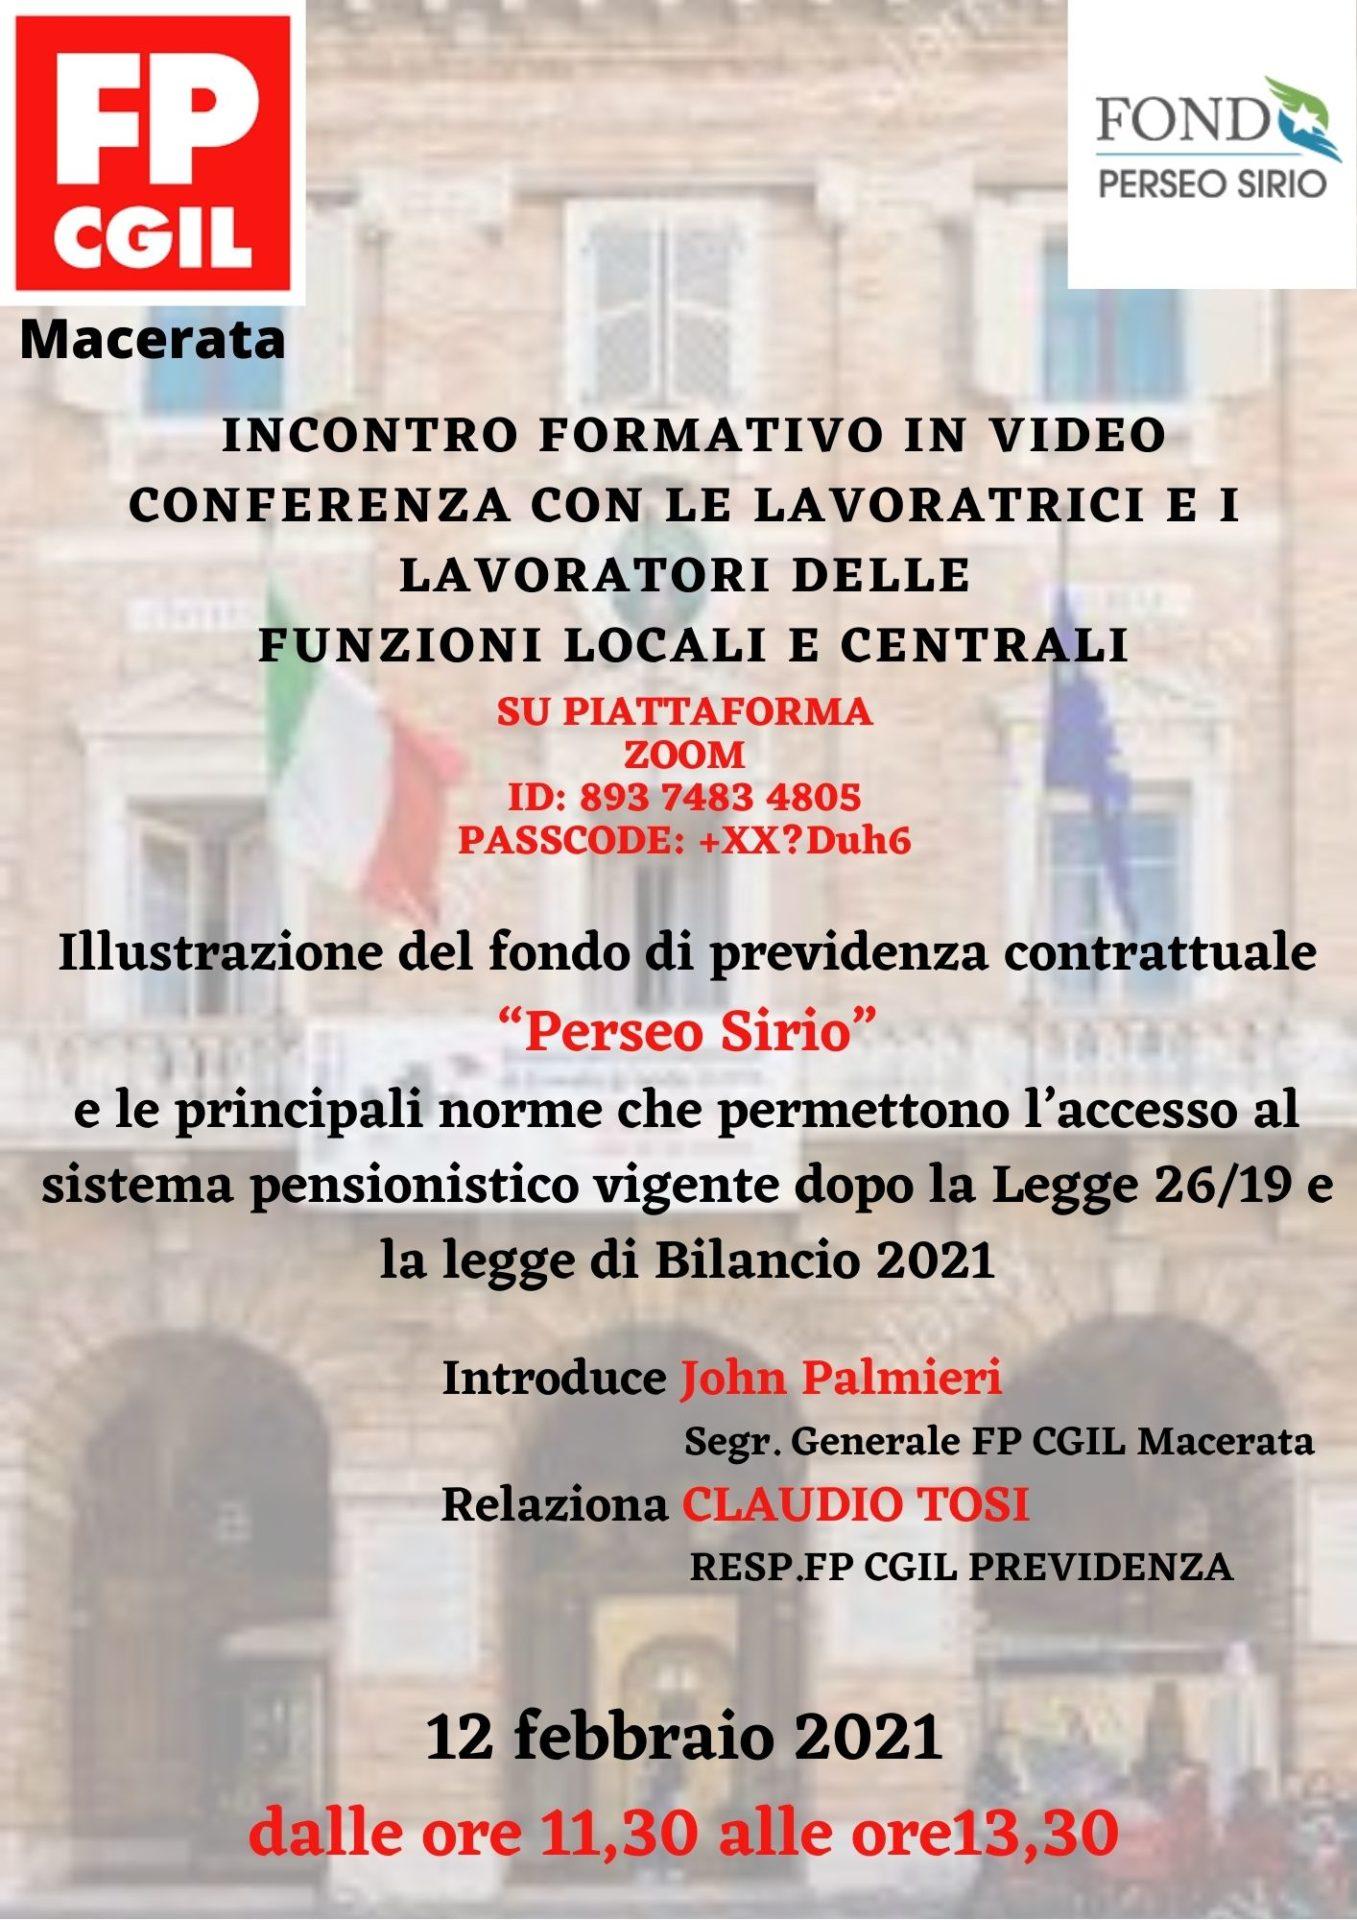 FL FC Macerata